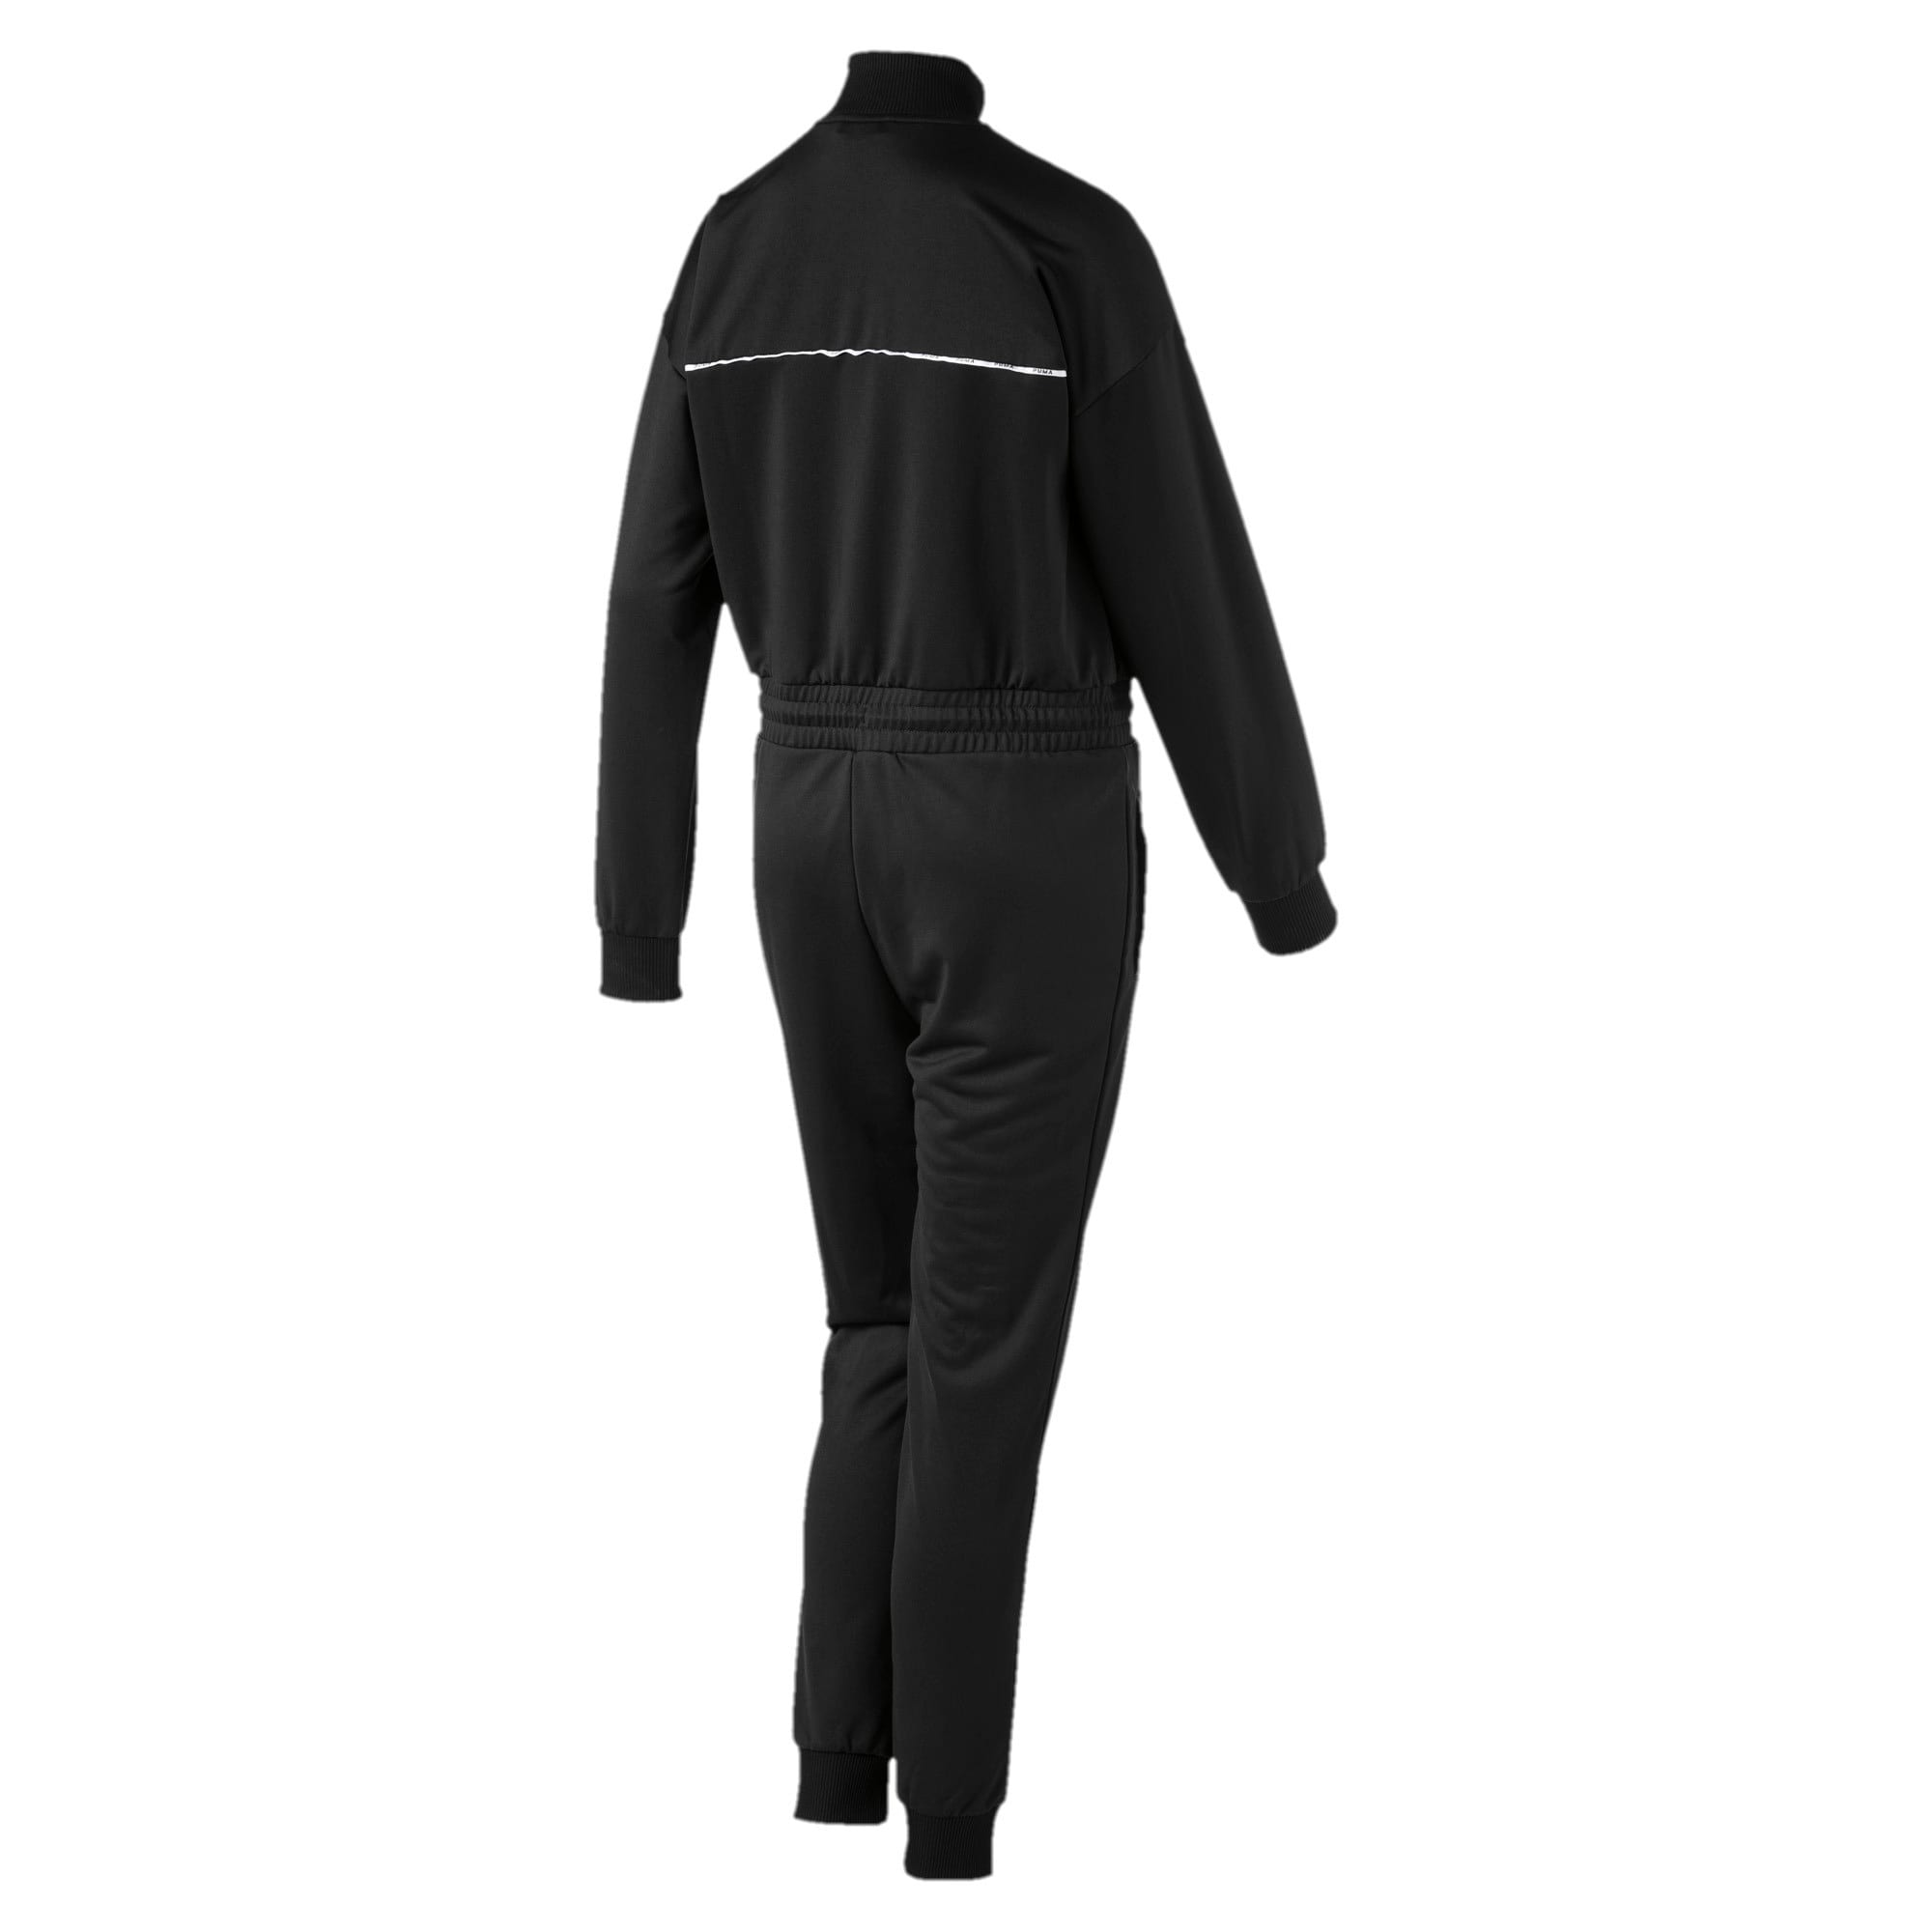 Thumbnail 5 of PUMA XTG Women's Jumpsuit, Puma Black, medium